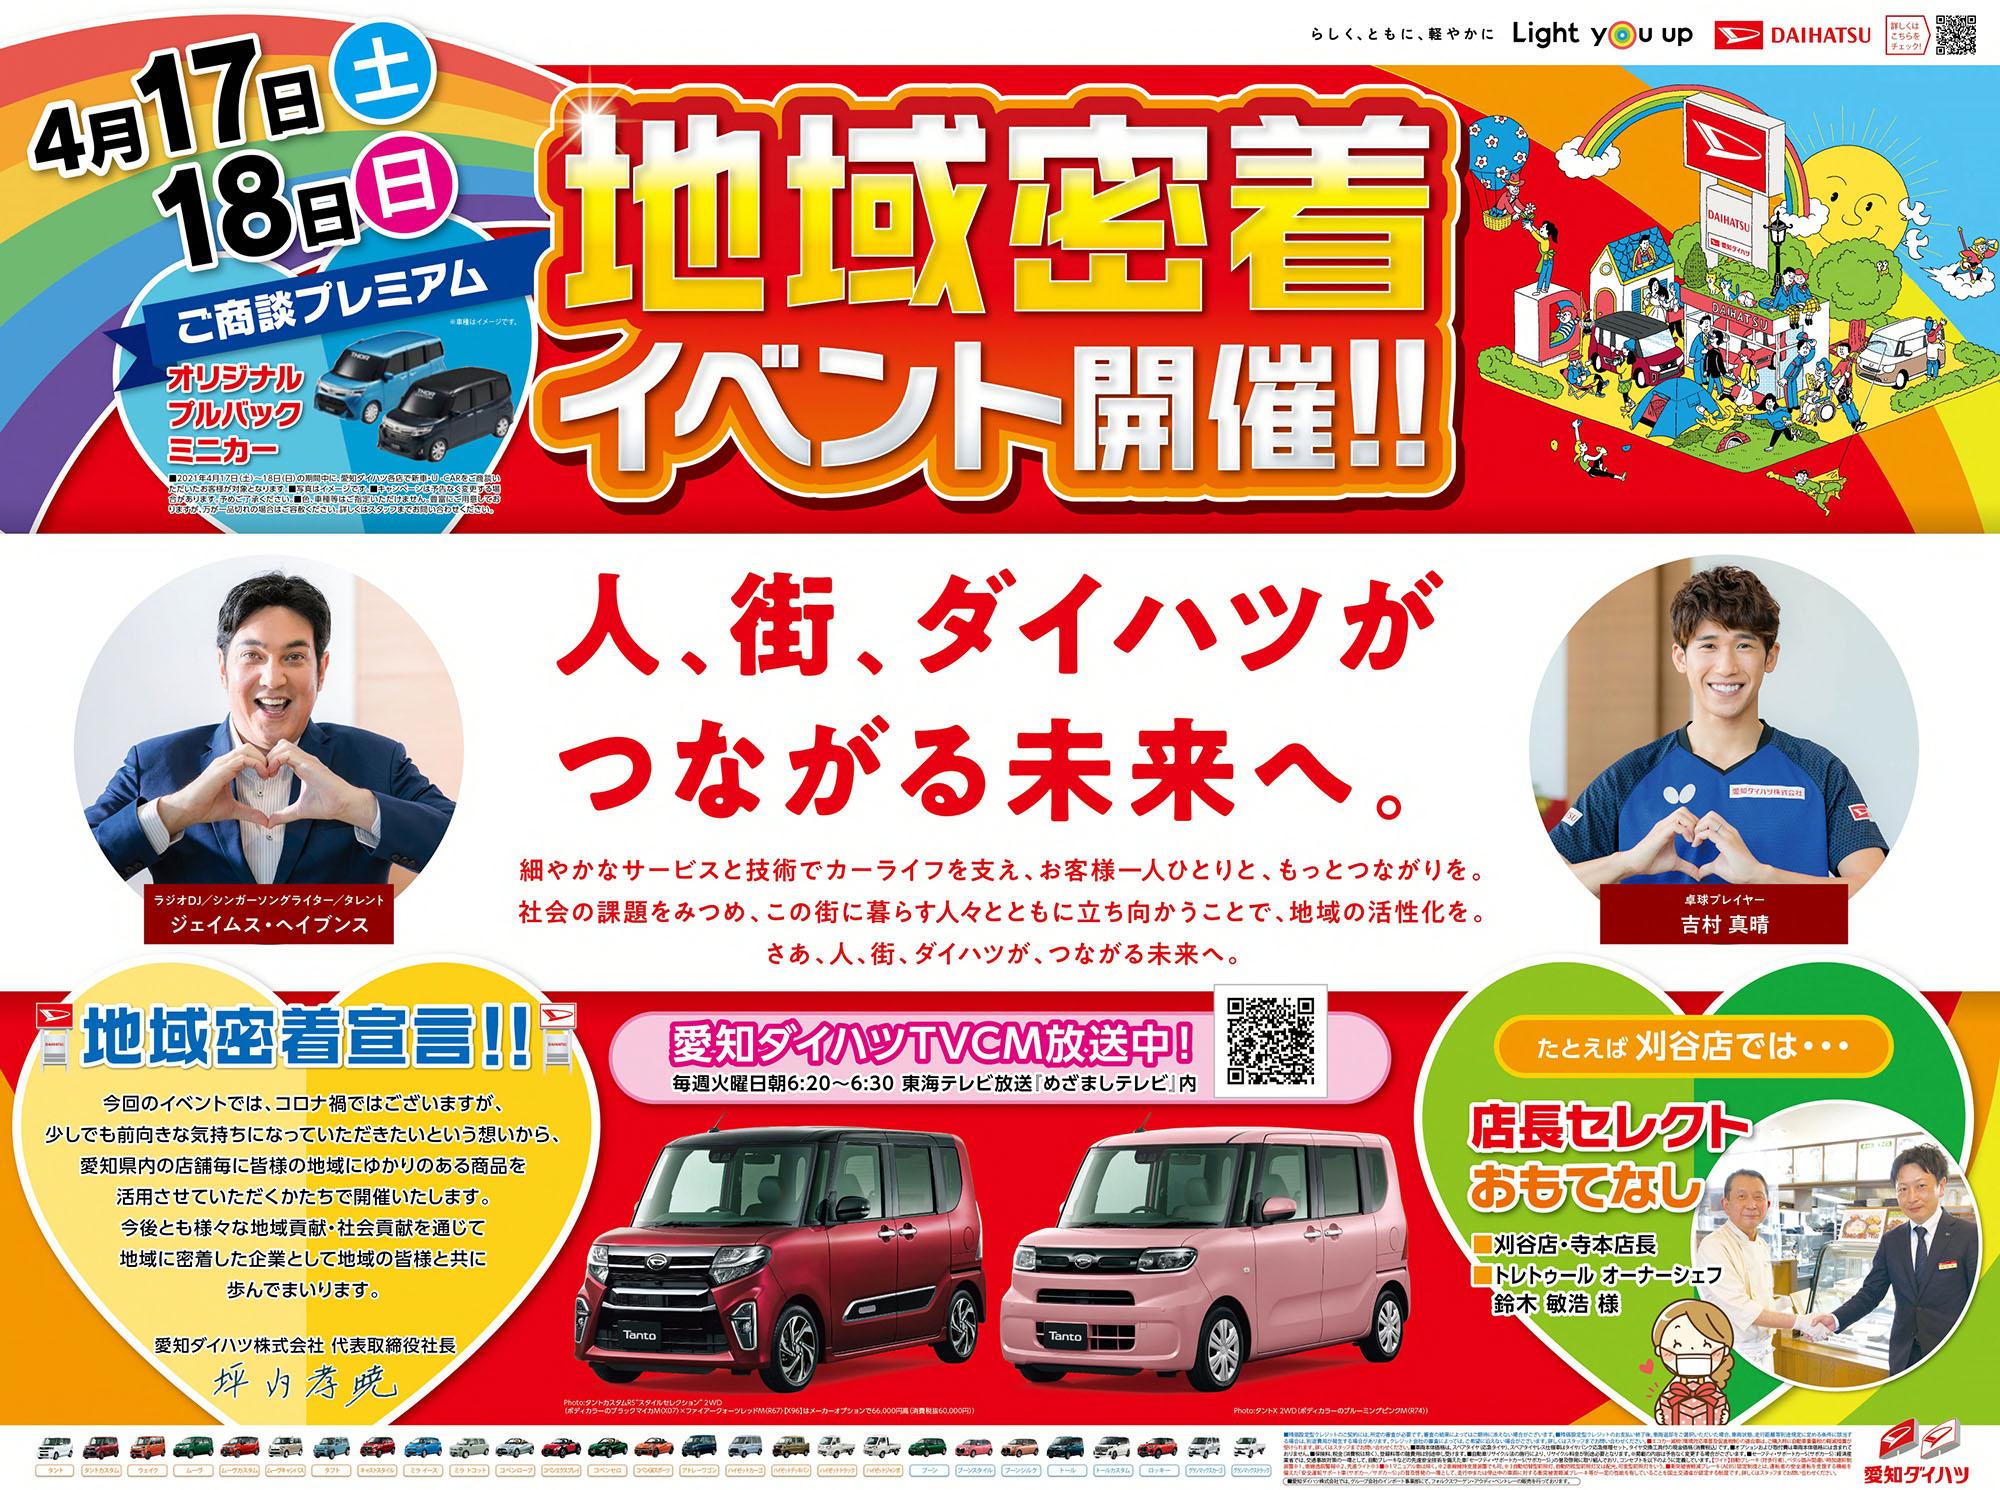 地域密着イベント開催!4月10日(土)11日(日)